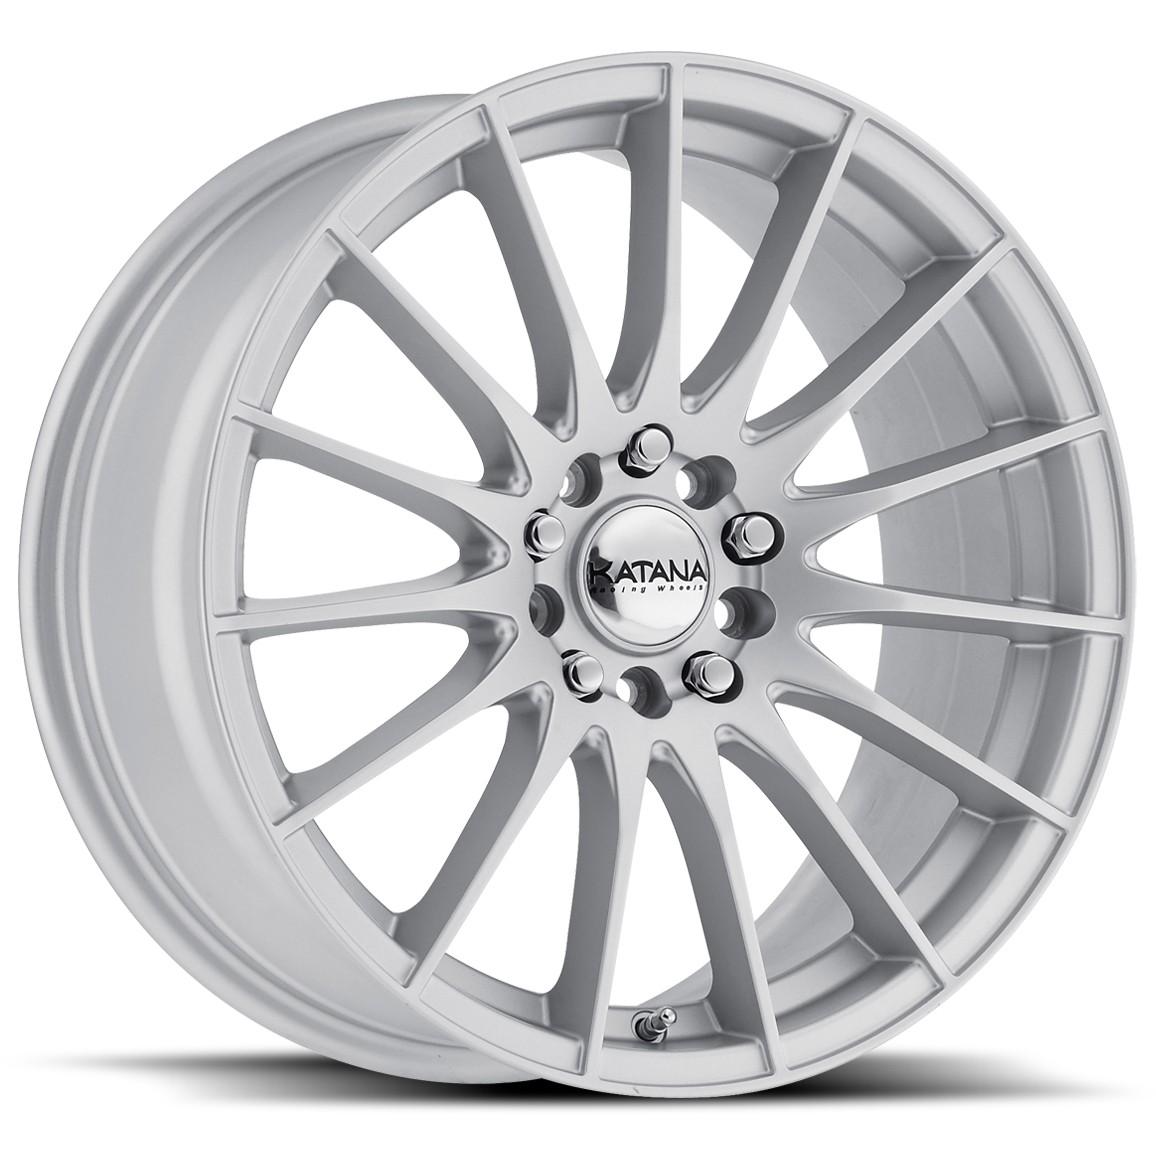 Katana KR33 17x8 4x100 4x114.3 40et Gloss Silver Wheels Rims